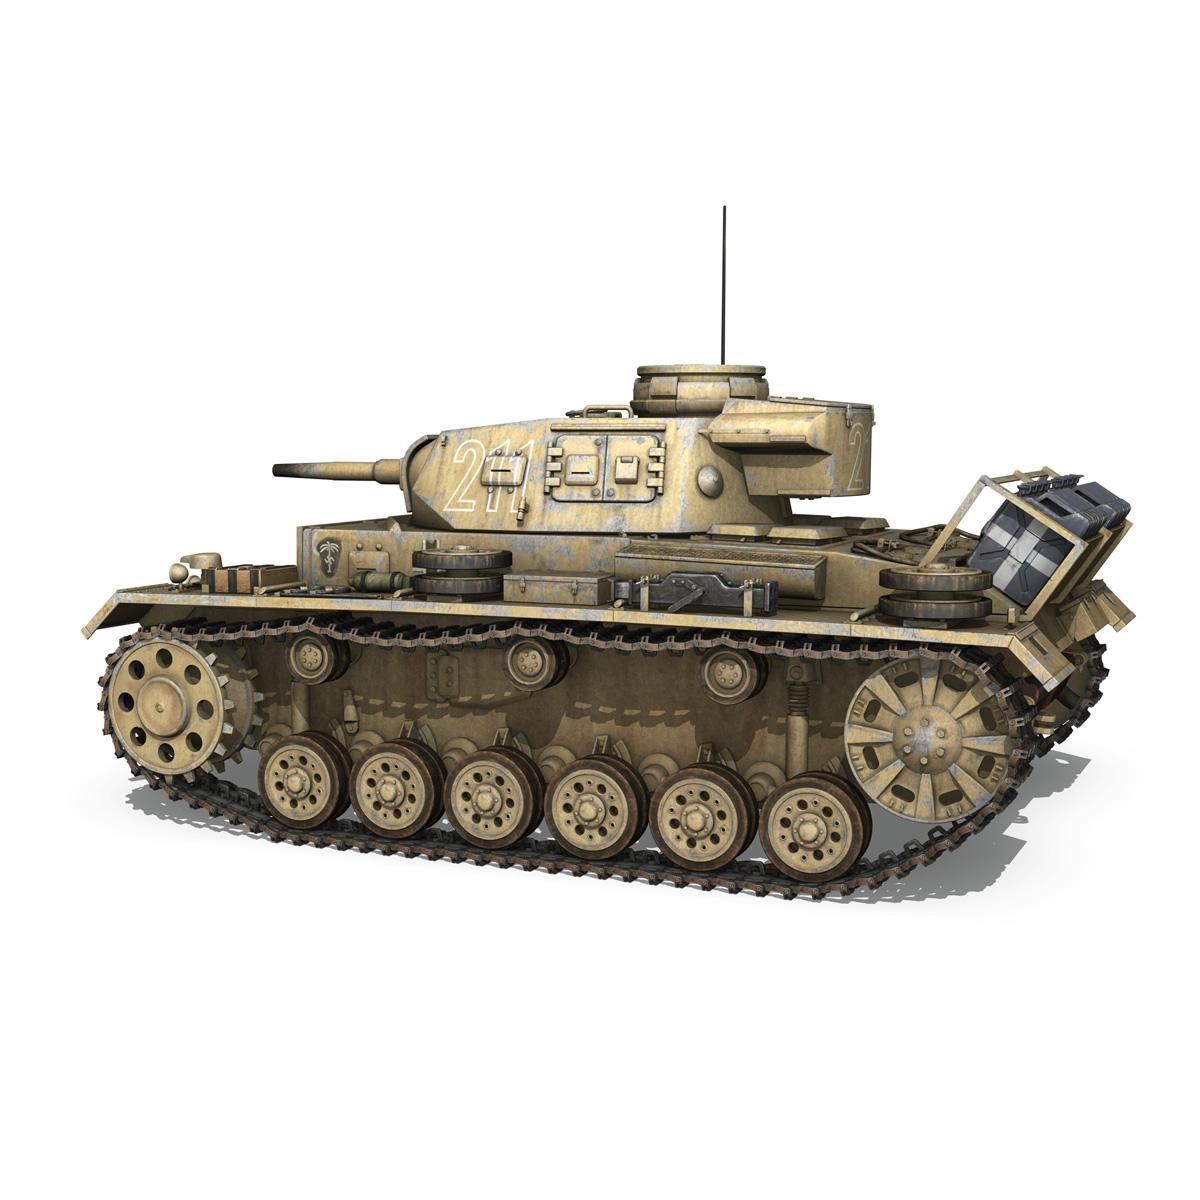 pzkpfw iii – panzer 3 – ausf.g – dak – 211 3d model 3ds c4d fbx lwo lw lws obj 266465